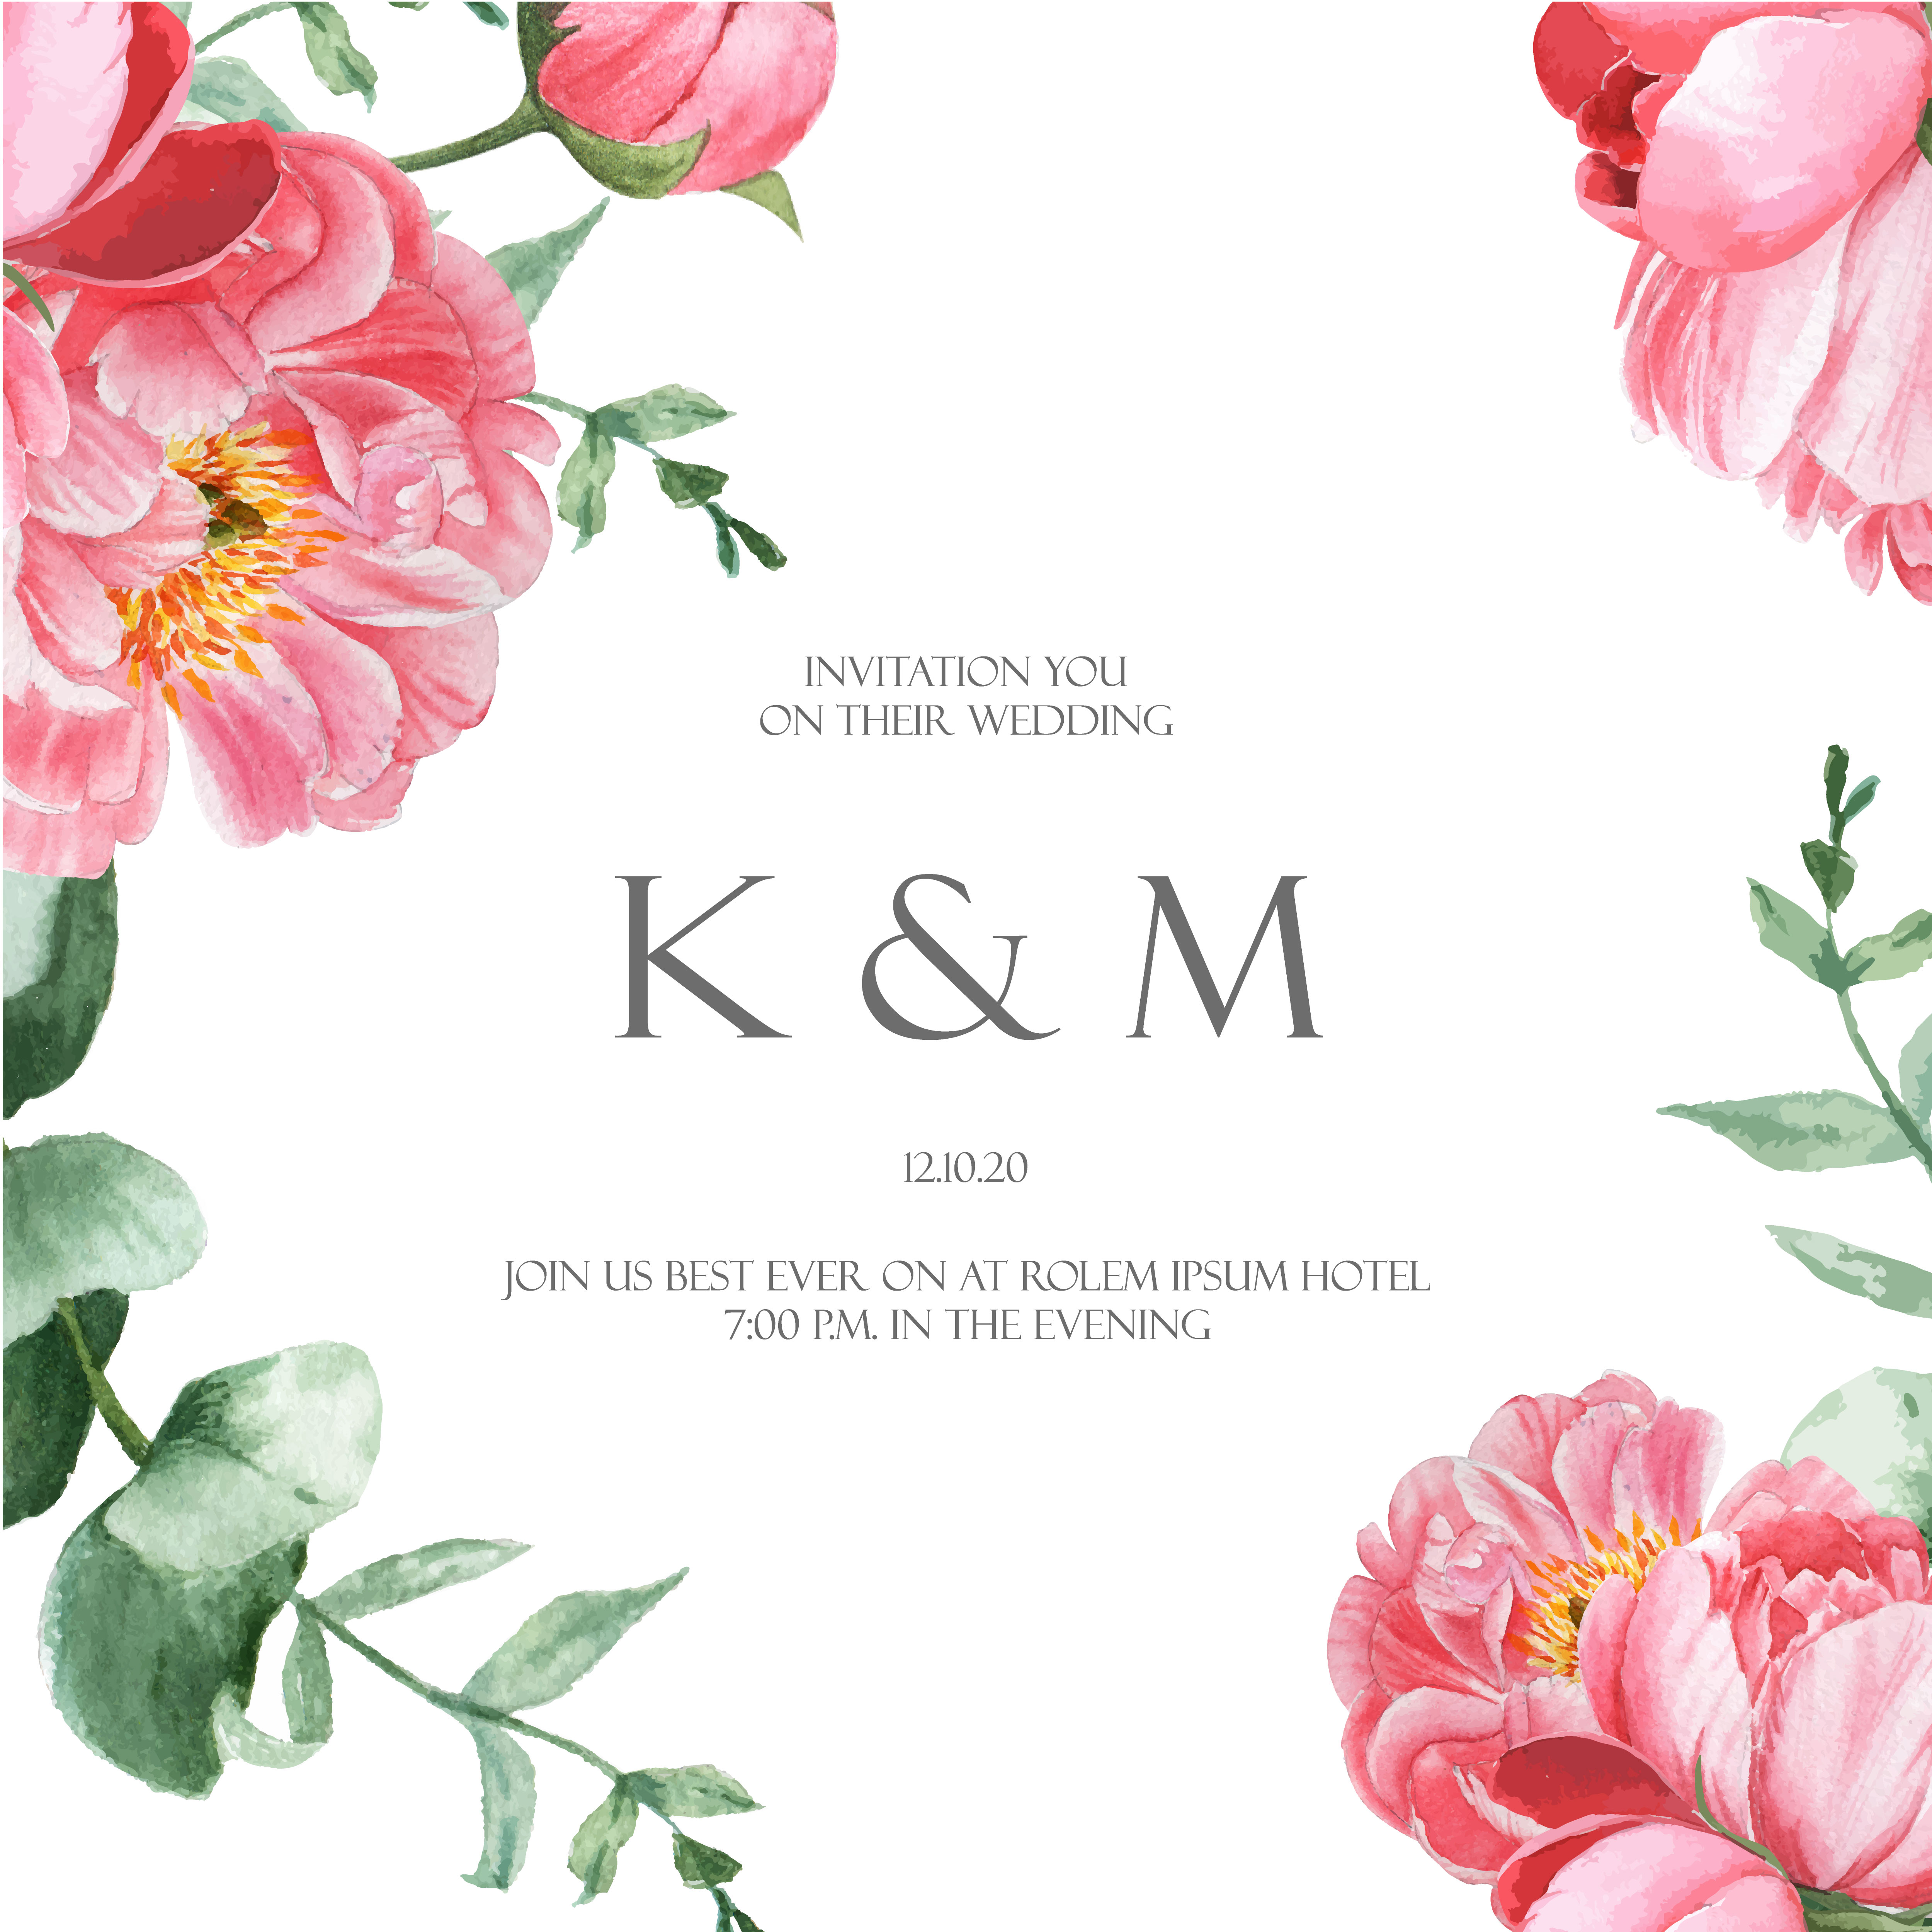 Wedding Flower Background: Pink Peony Blooming Flower Botanical Watercolor Wedding